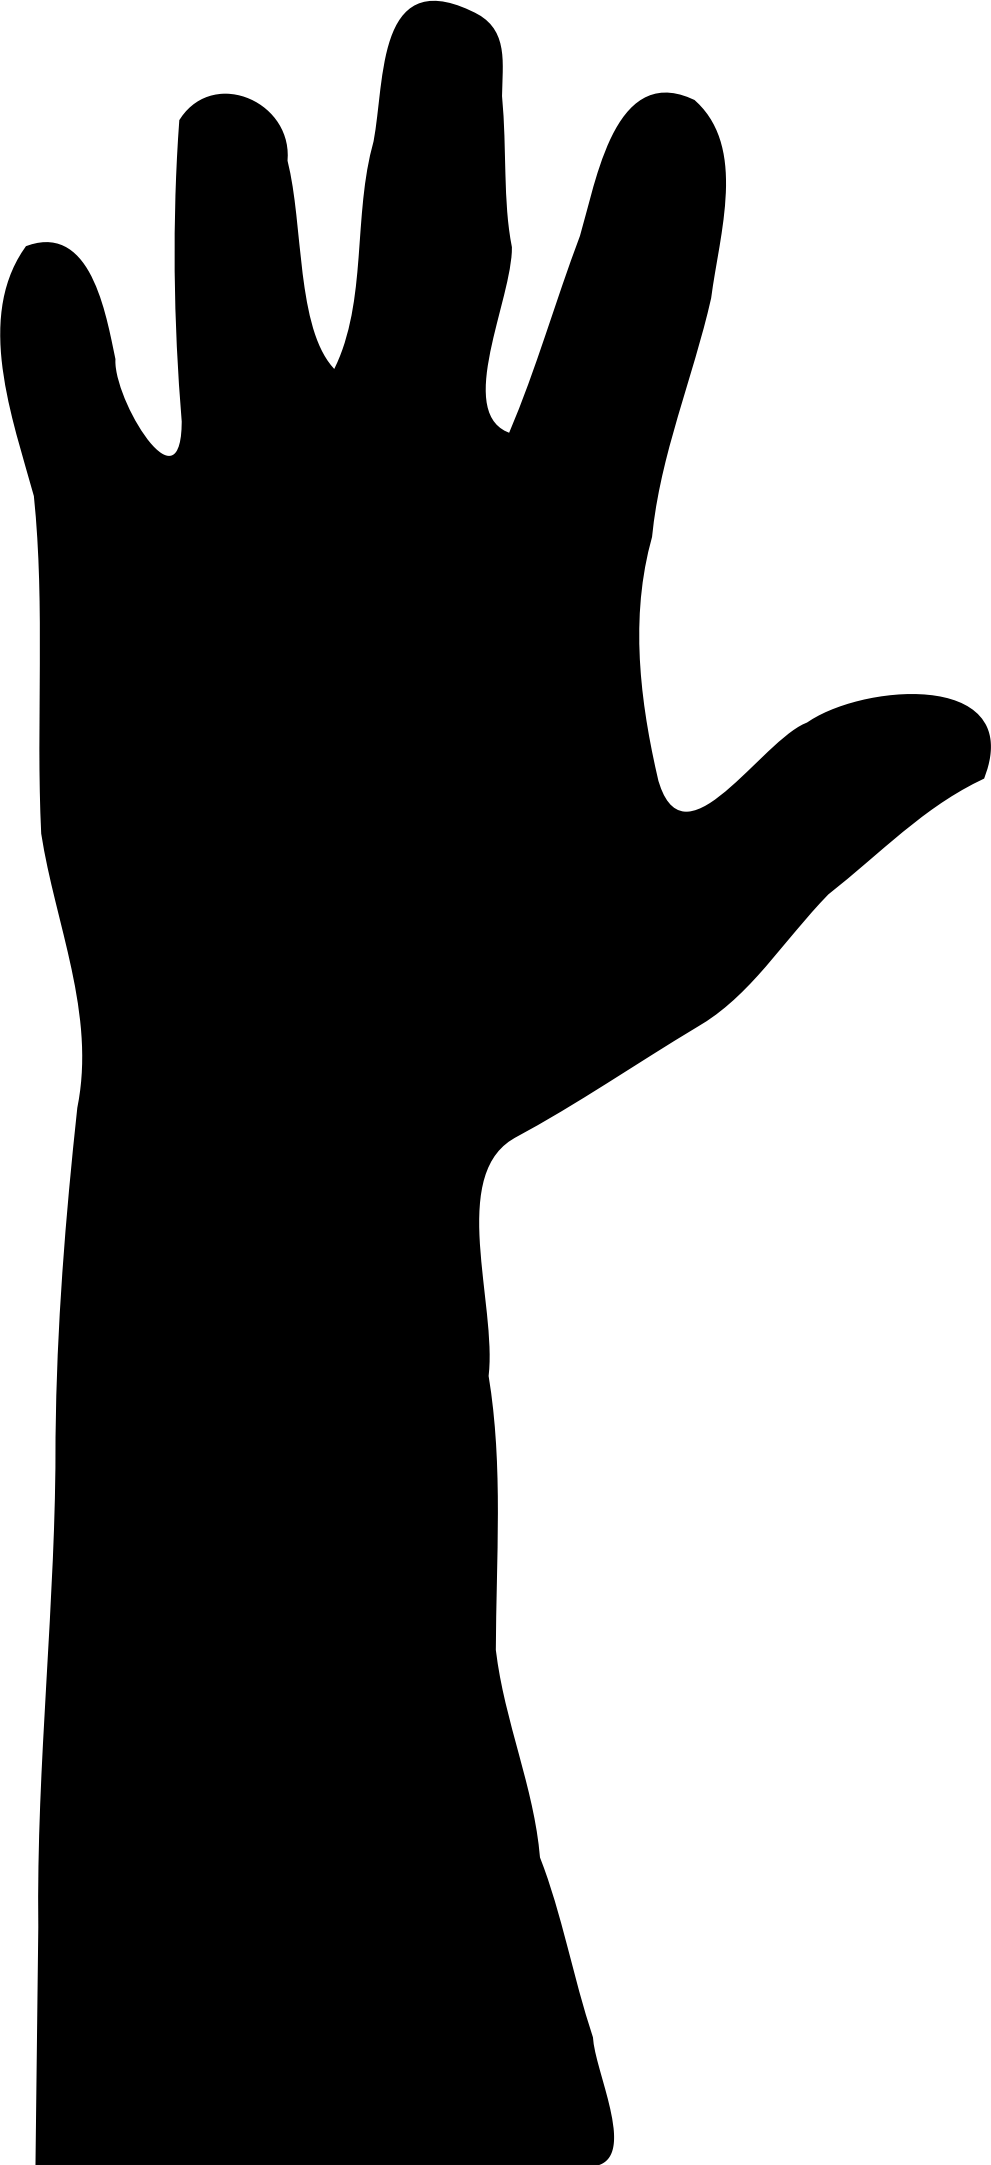 991x2165 Clipart